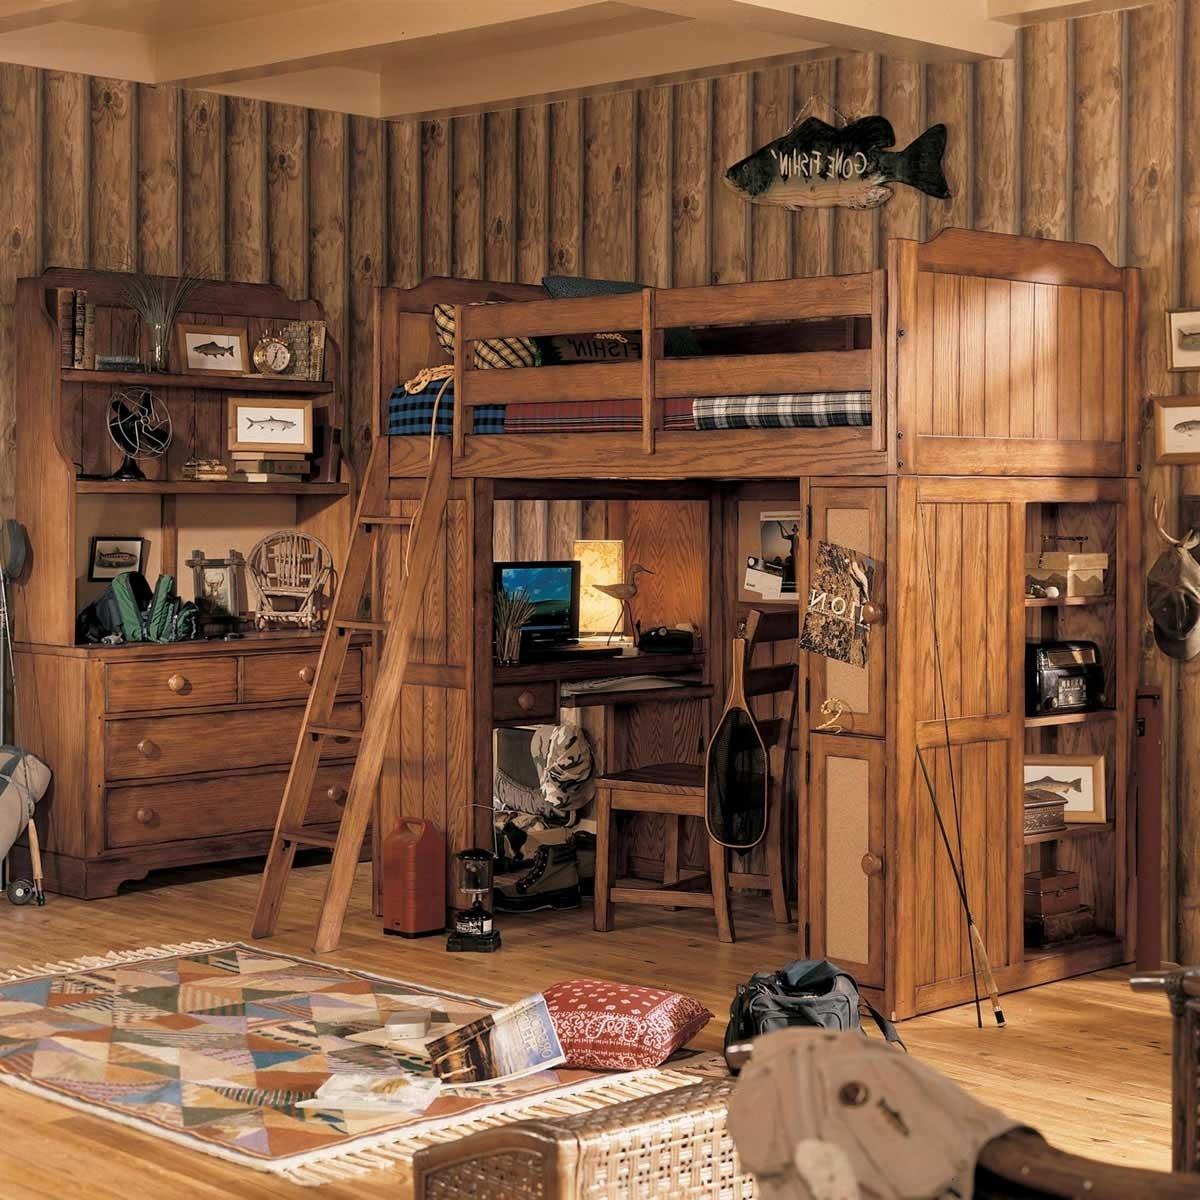 primitive home decor primitive country home décor for bedroom country primitive home decorating  ideas country RMLALEU